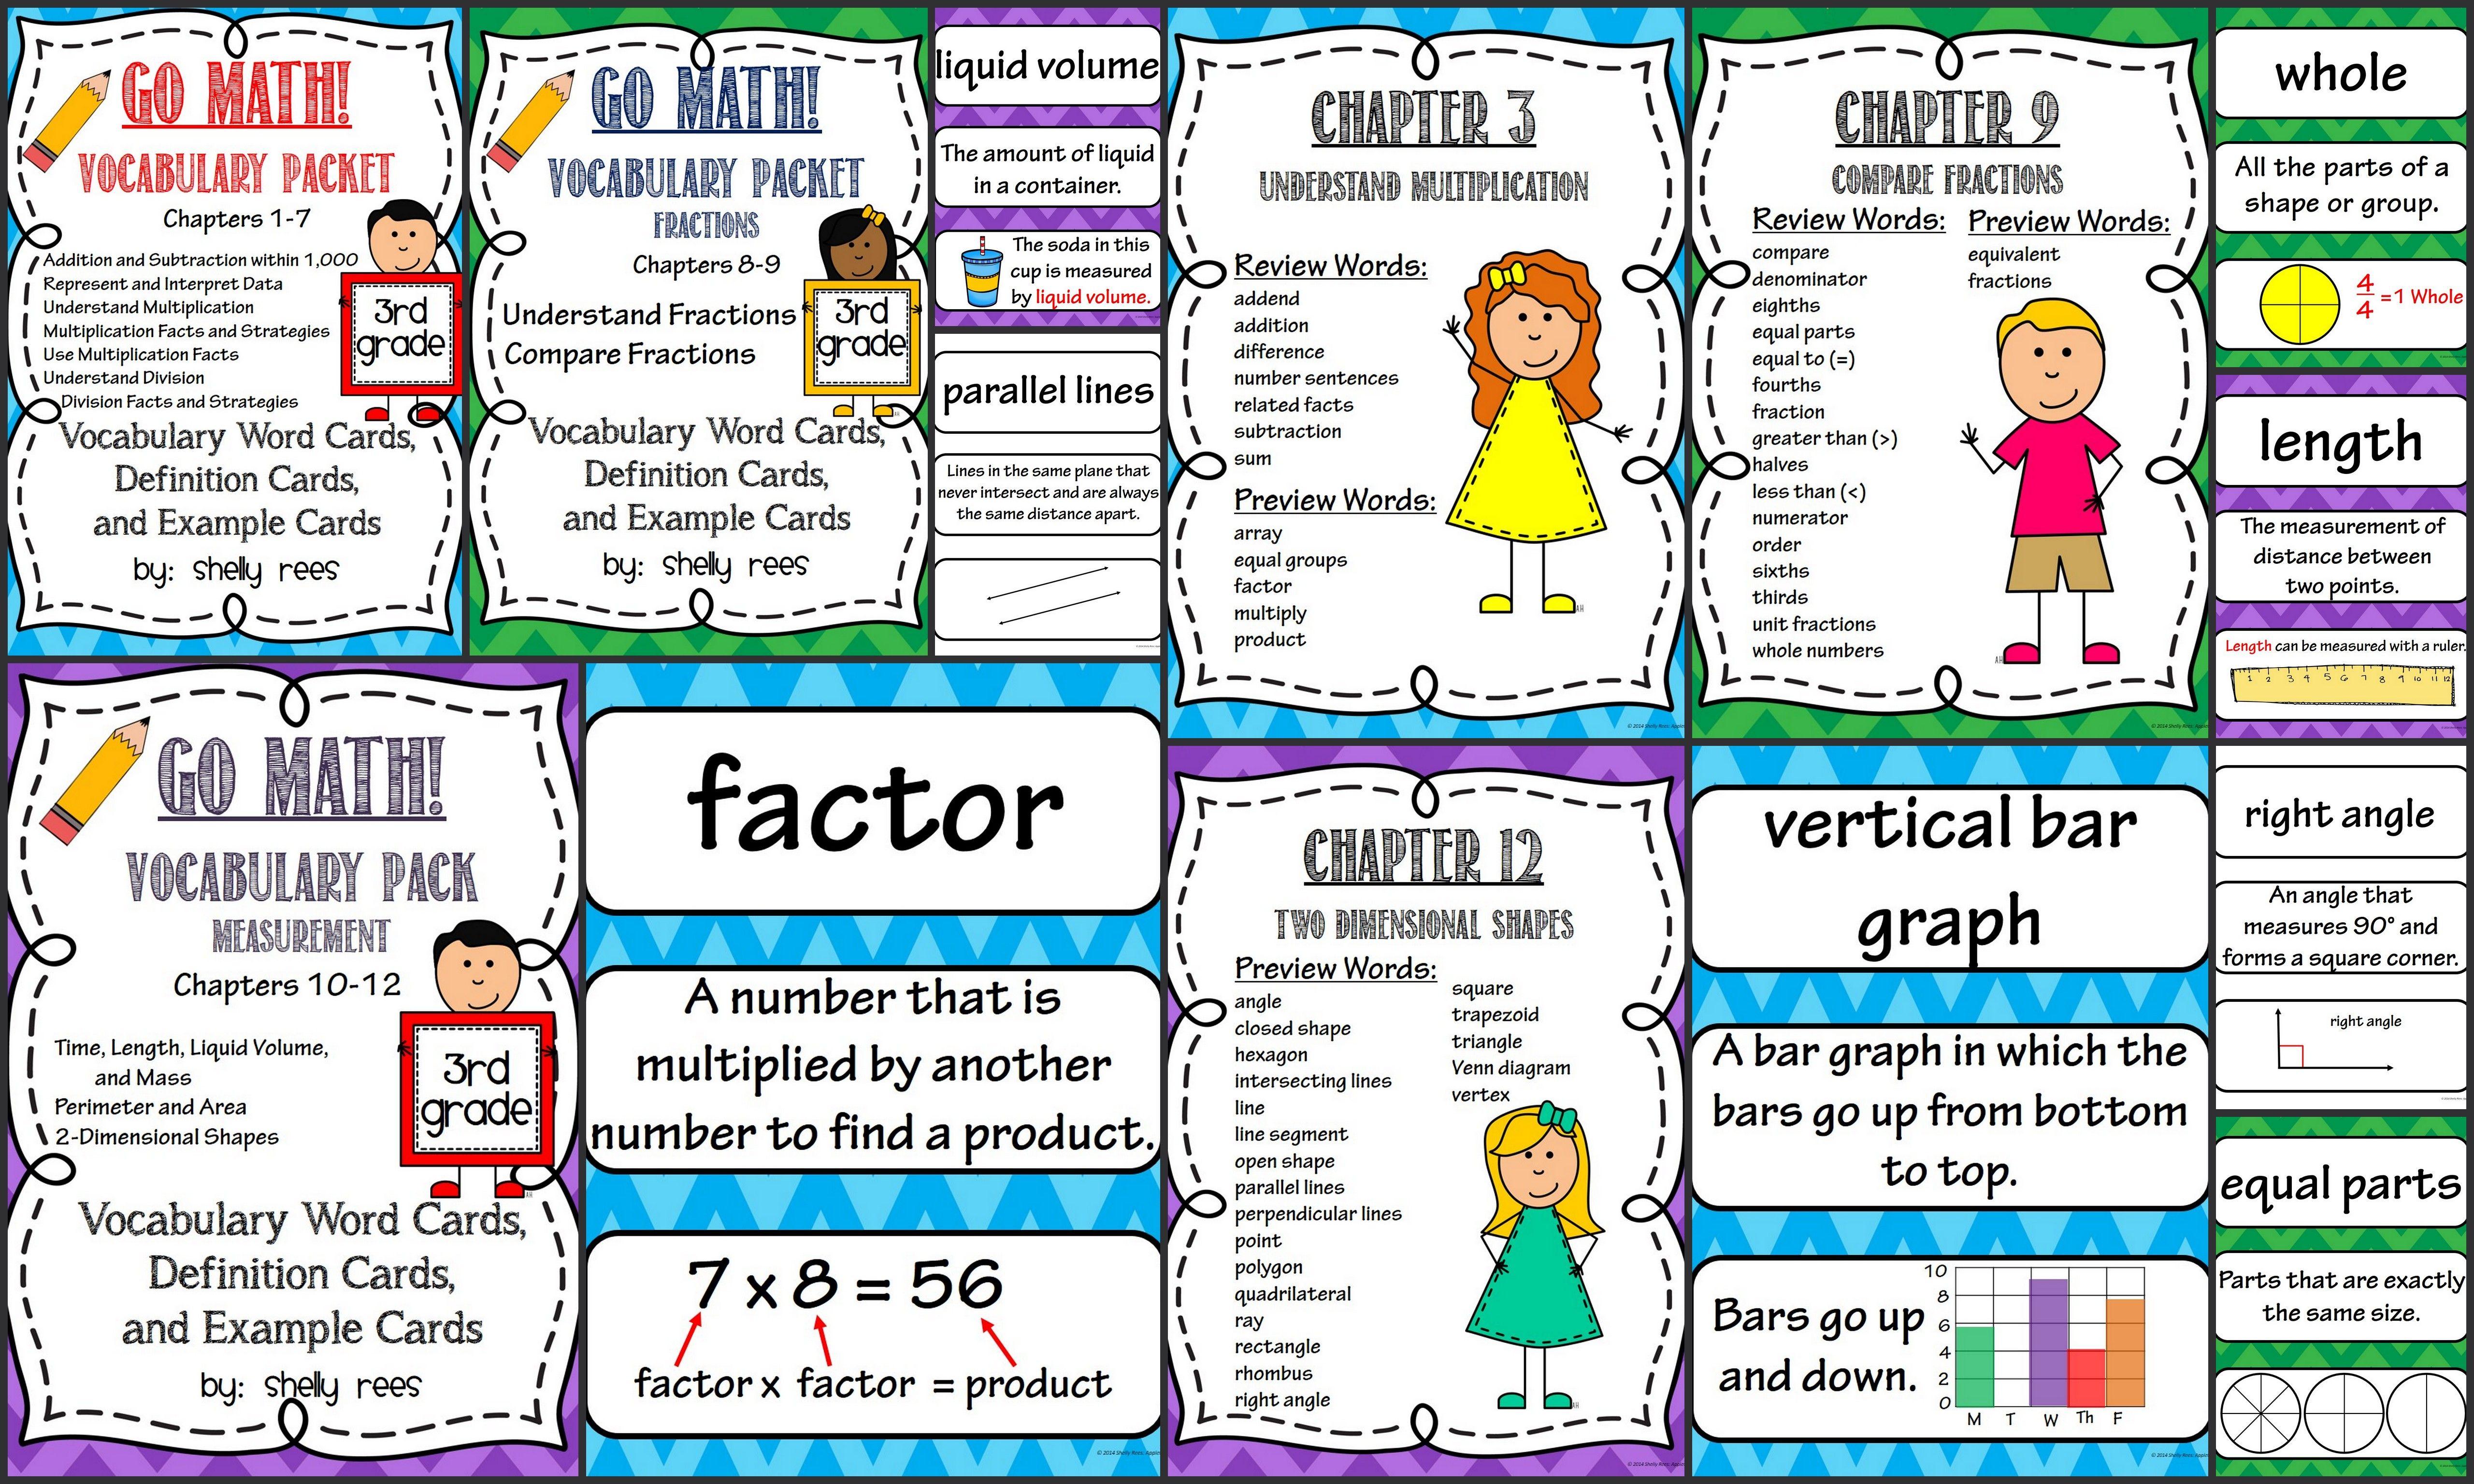 Go Math 3rd Grade Vocabulary for the Year Bundle | Math ...